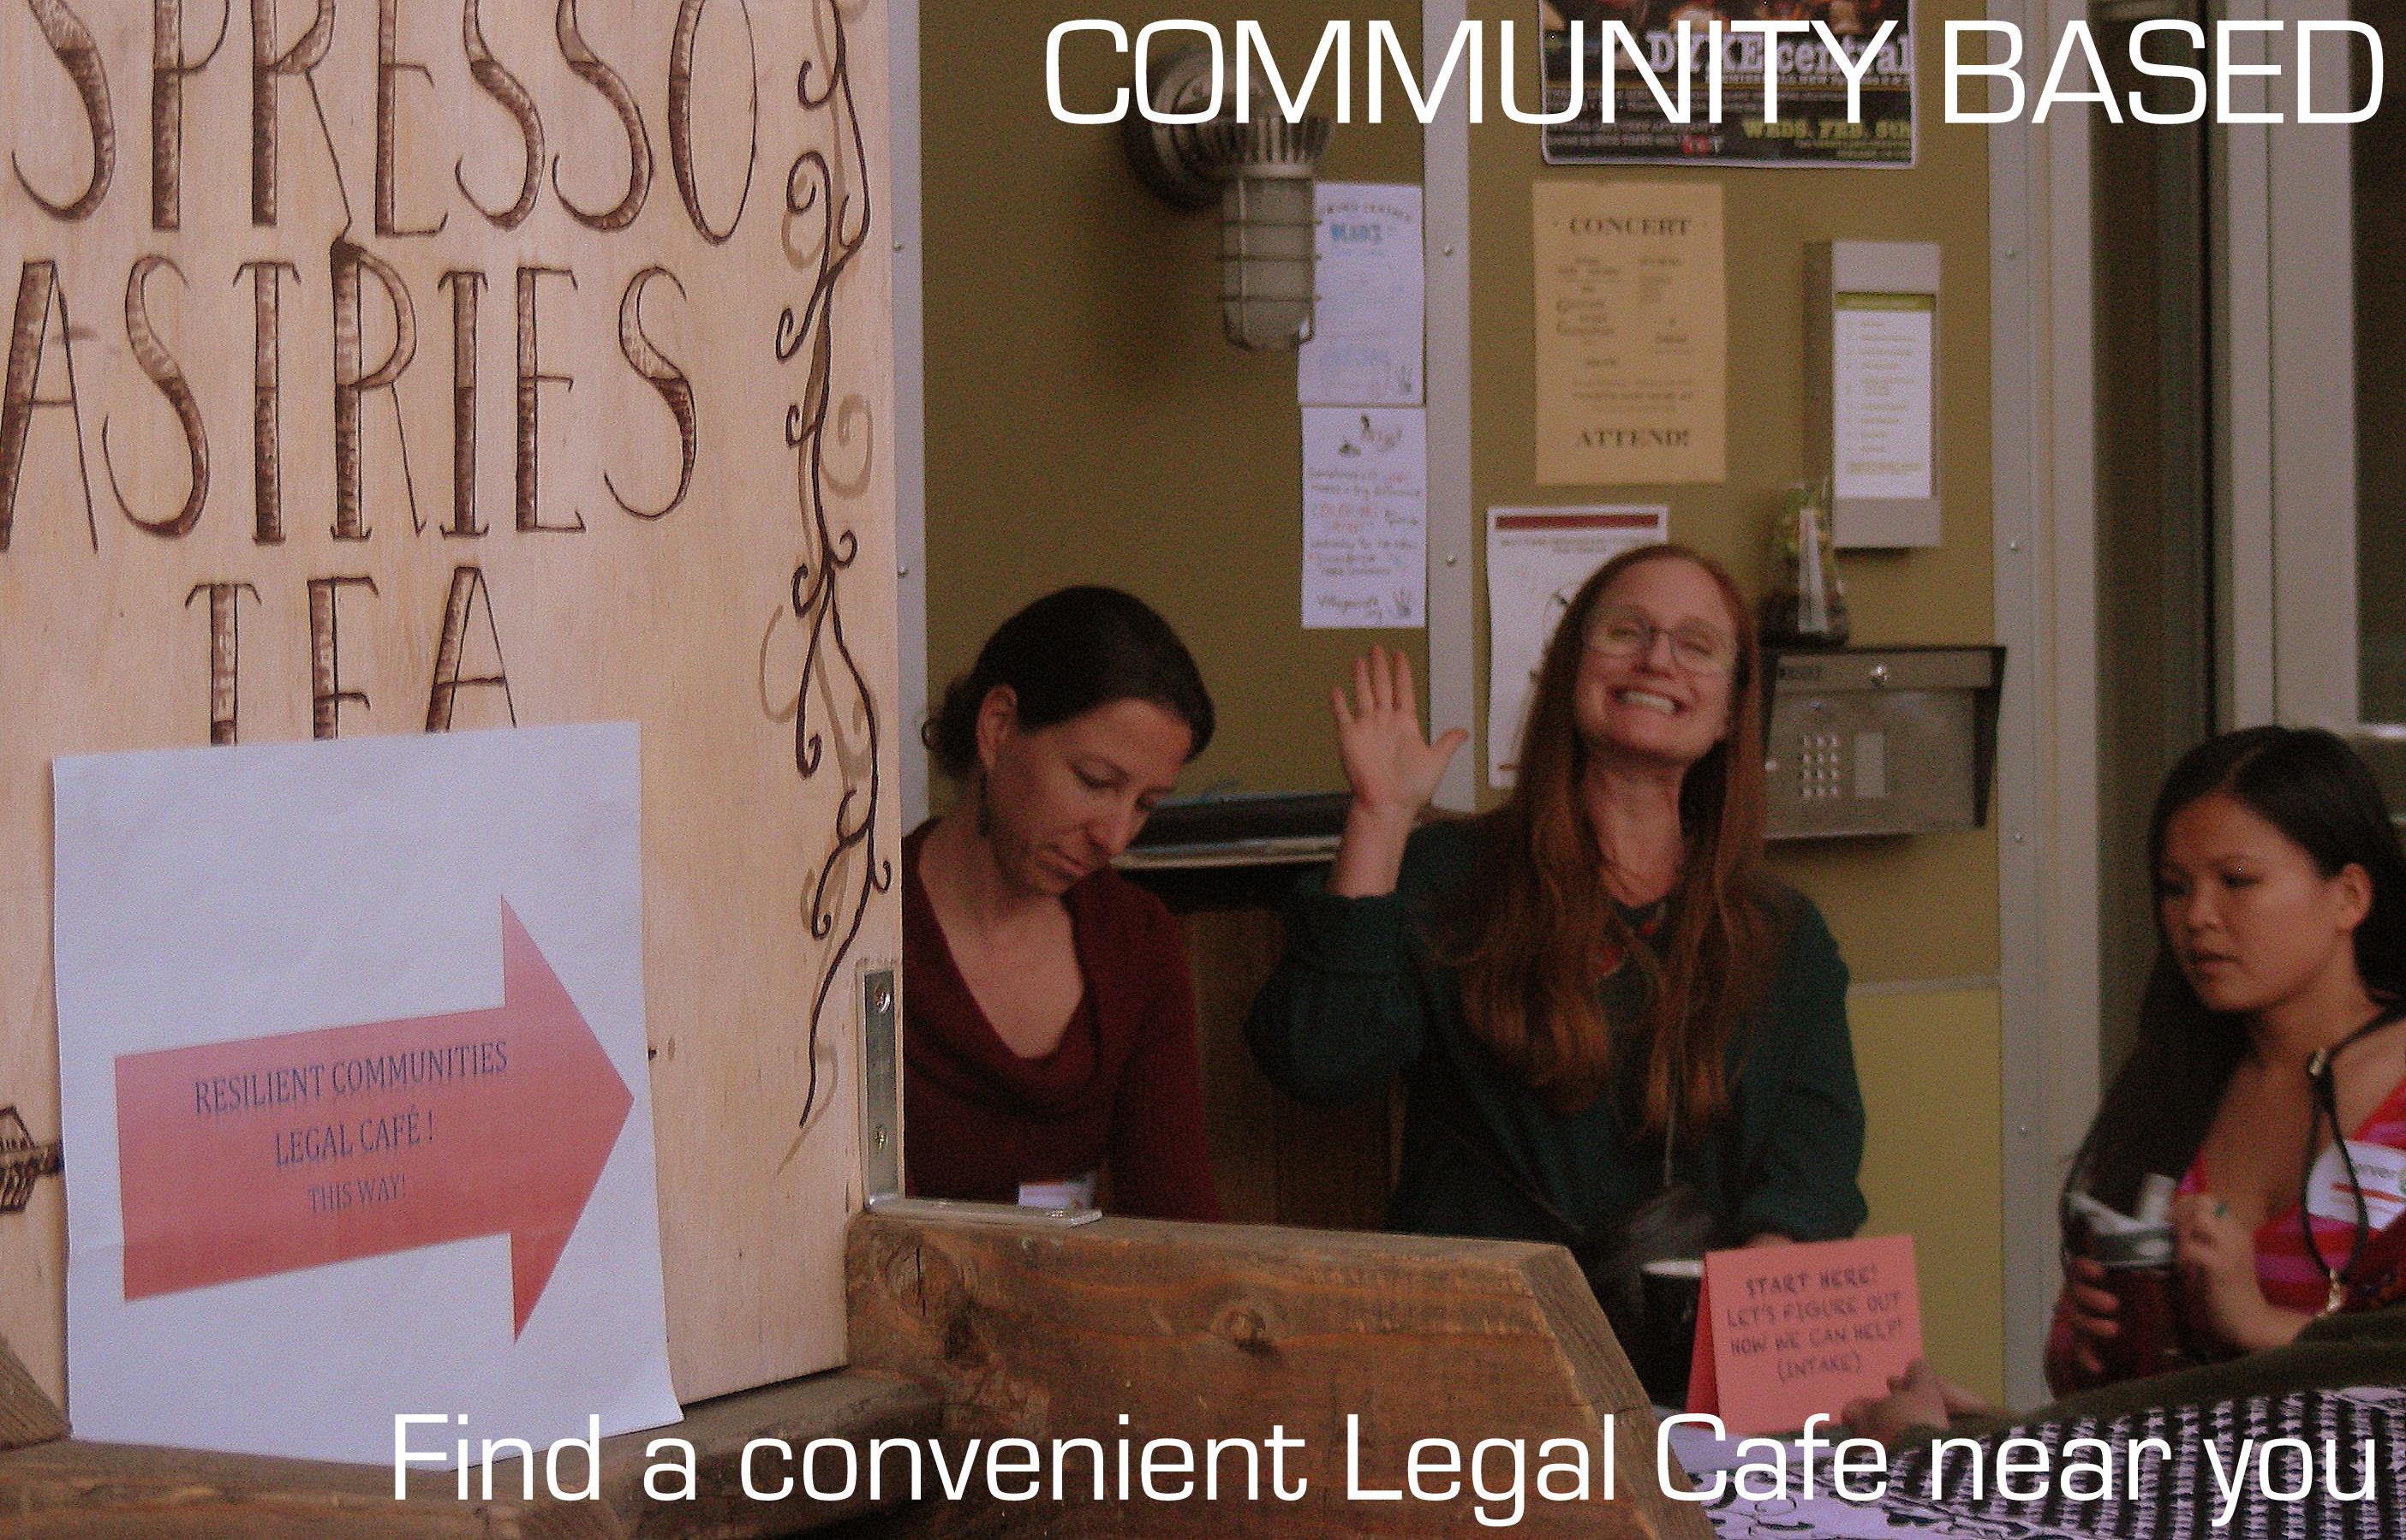 Community_Based_Legal_Cafe.JPG